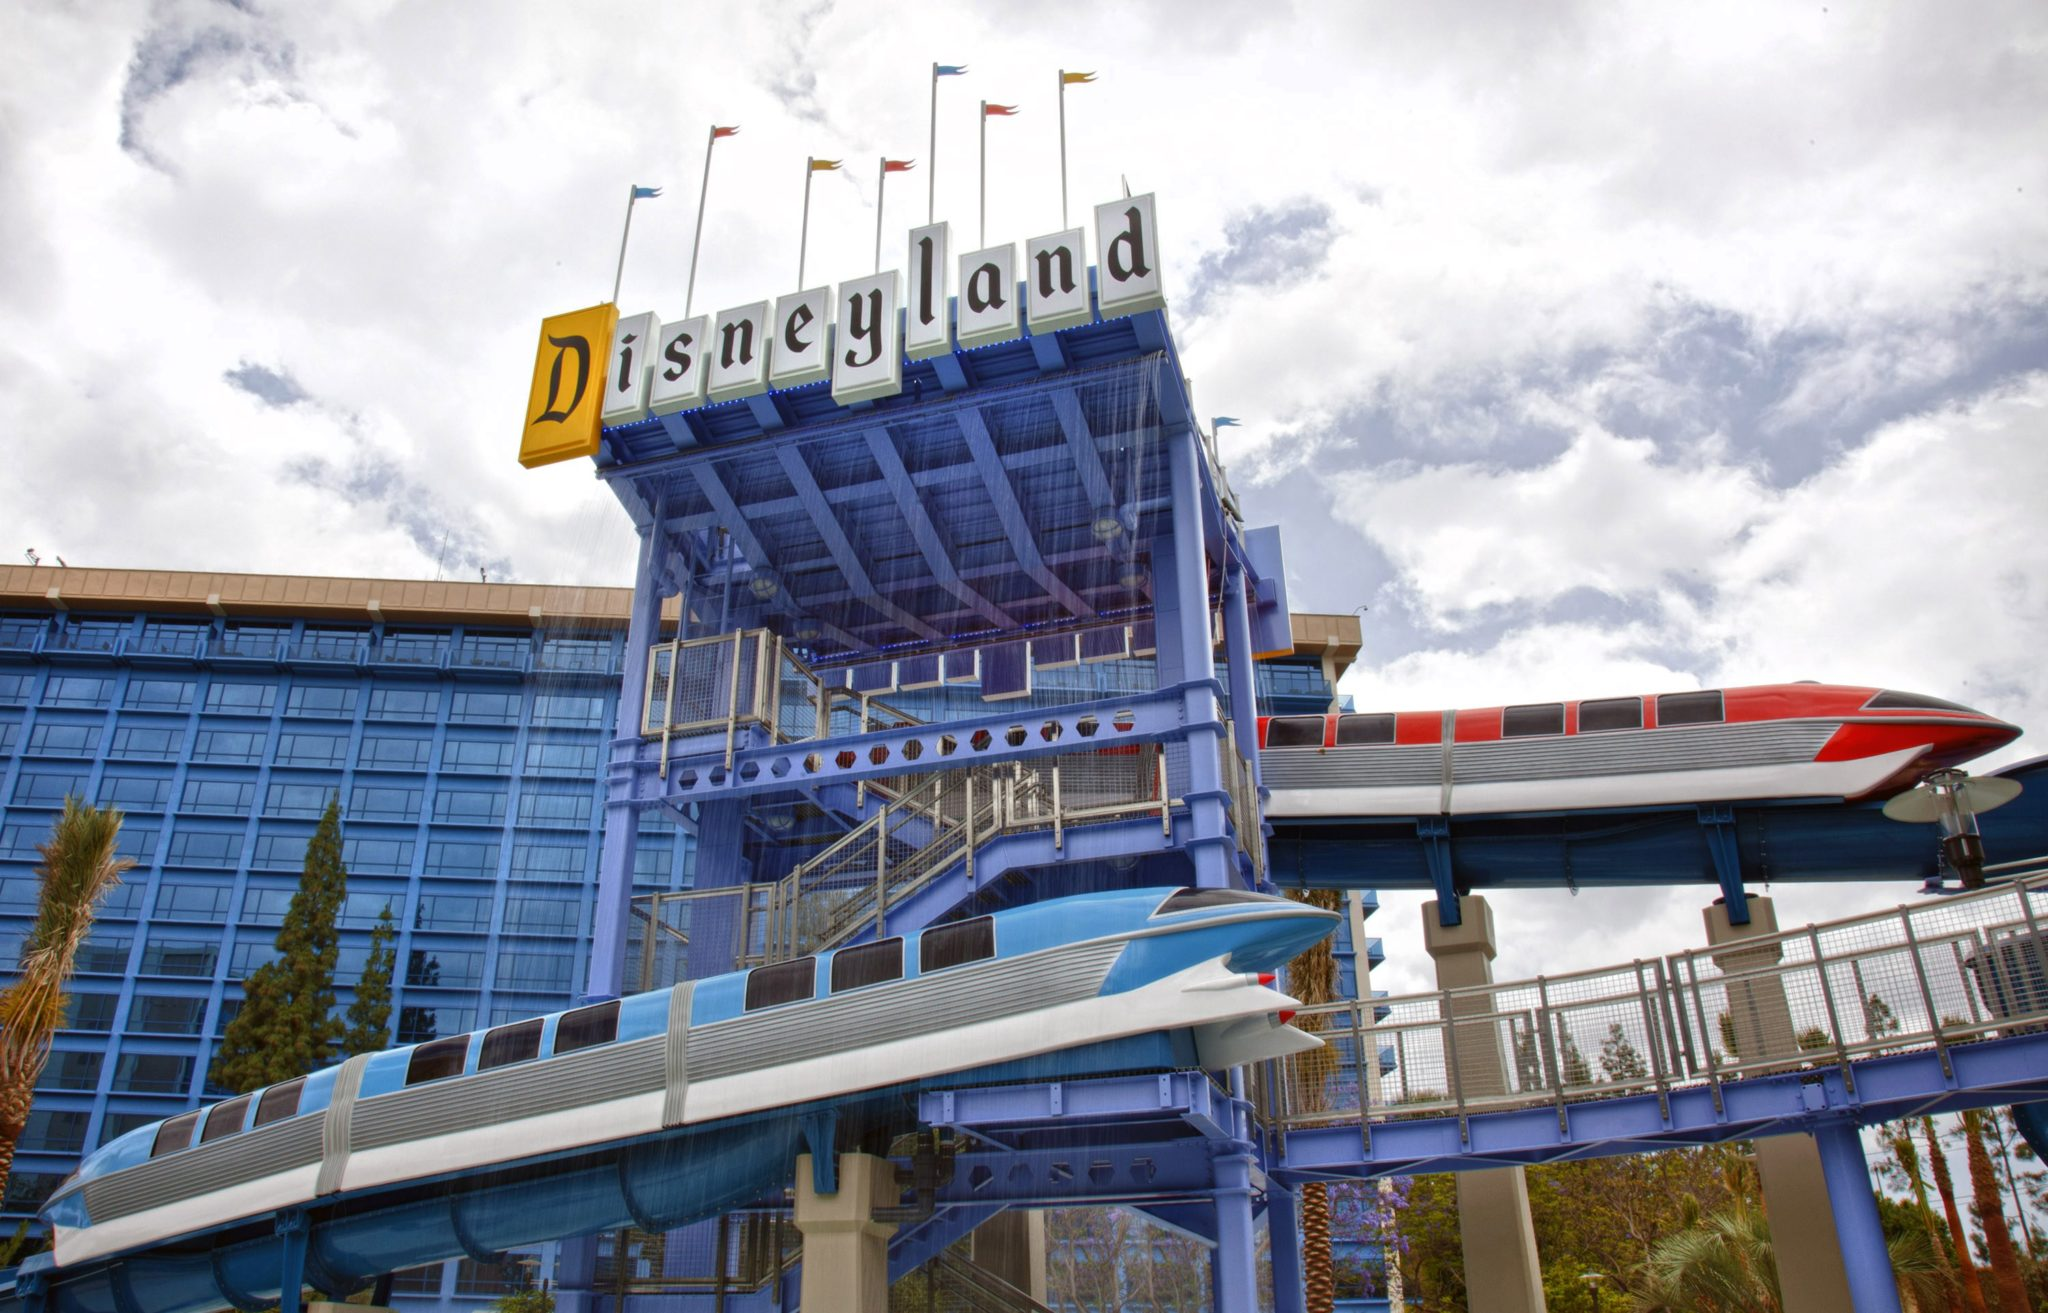 Disneyland Packages Best Way to Book Your Disneyland